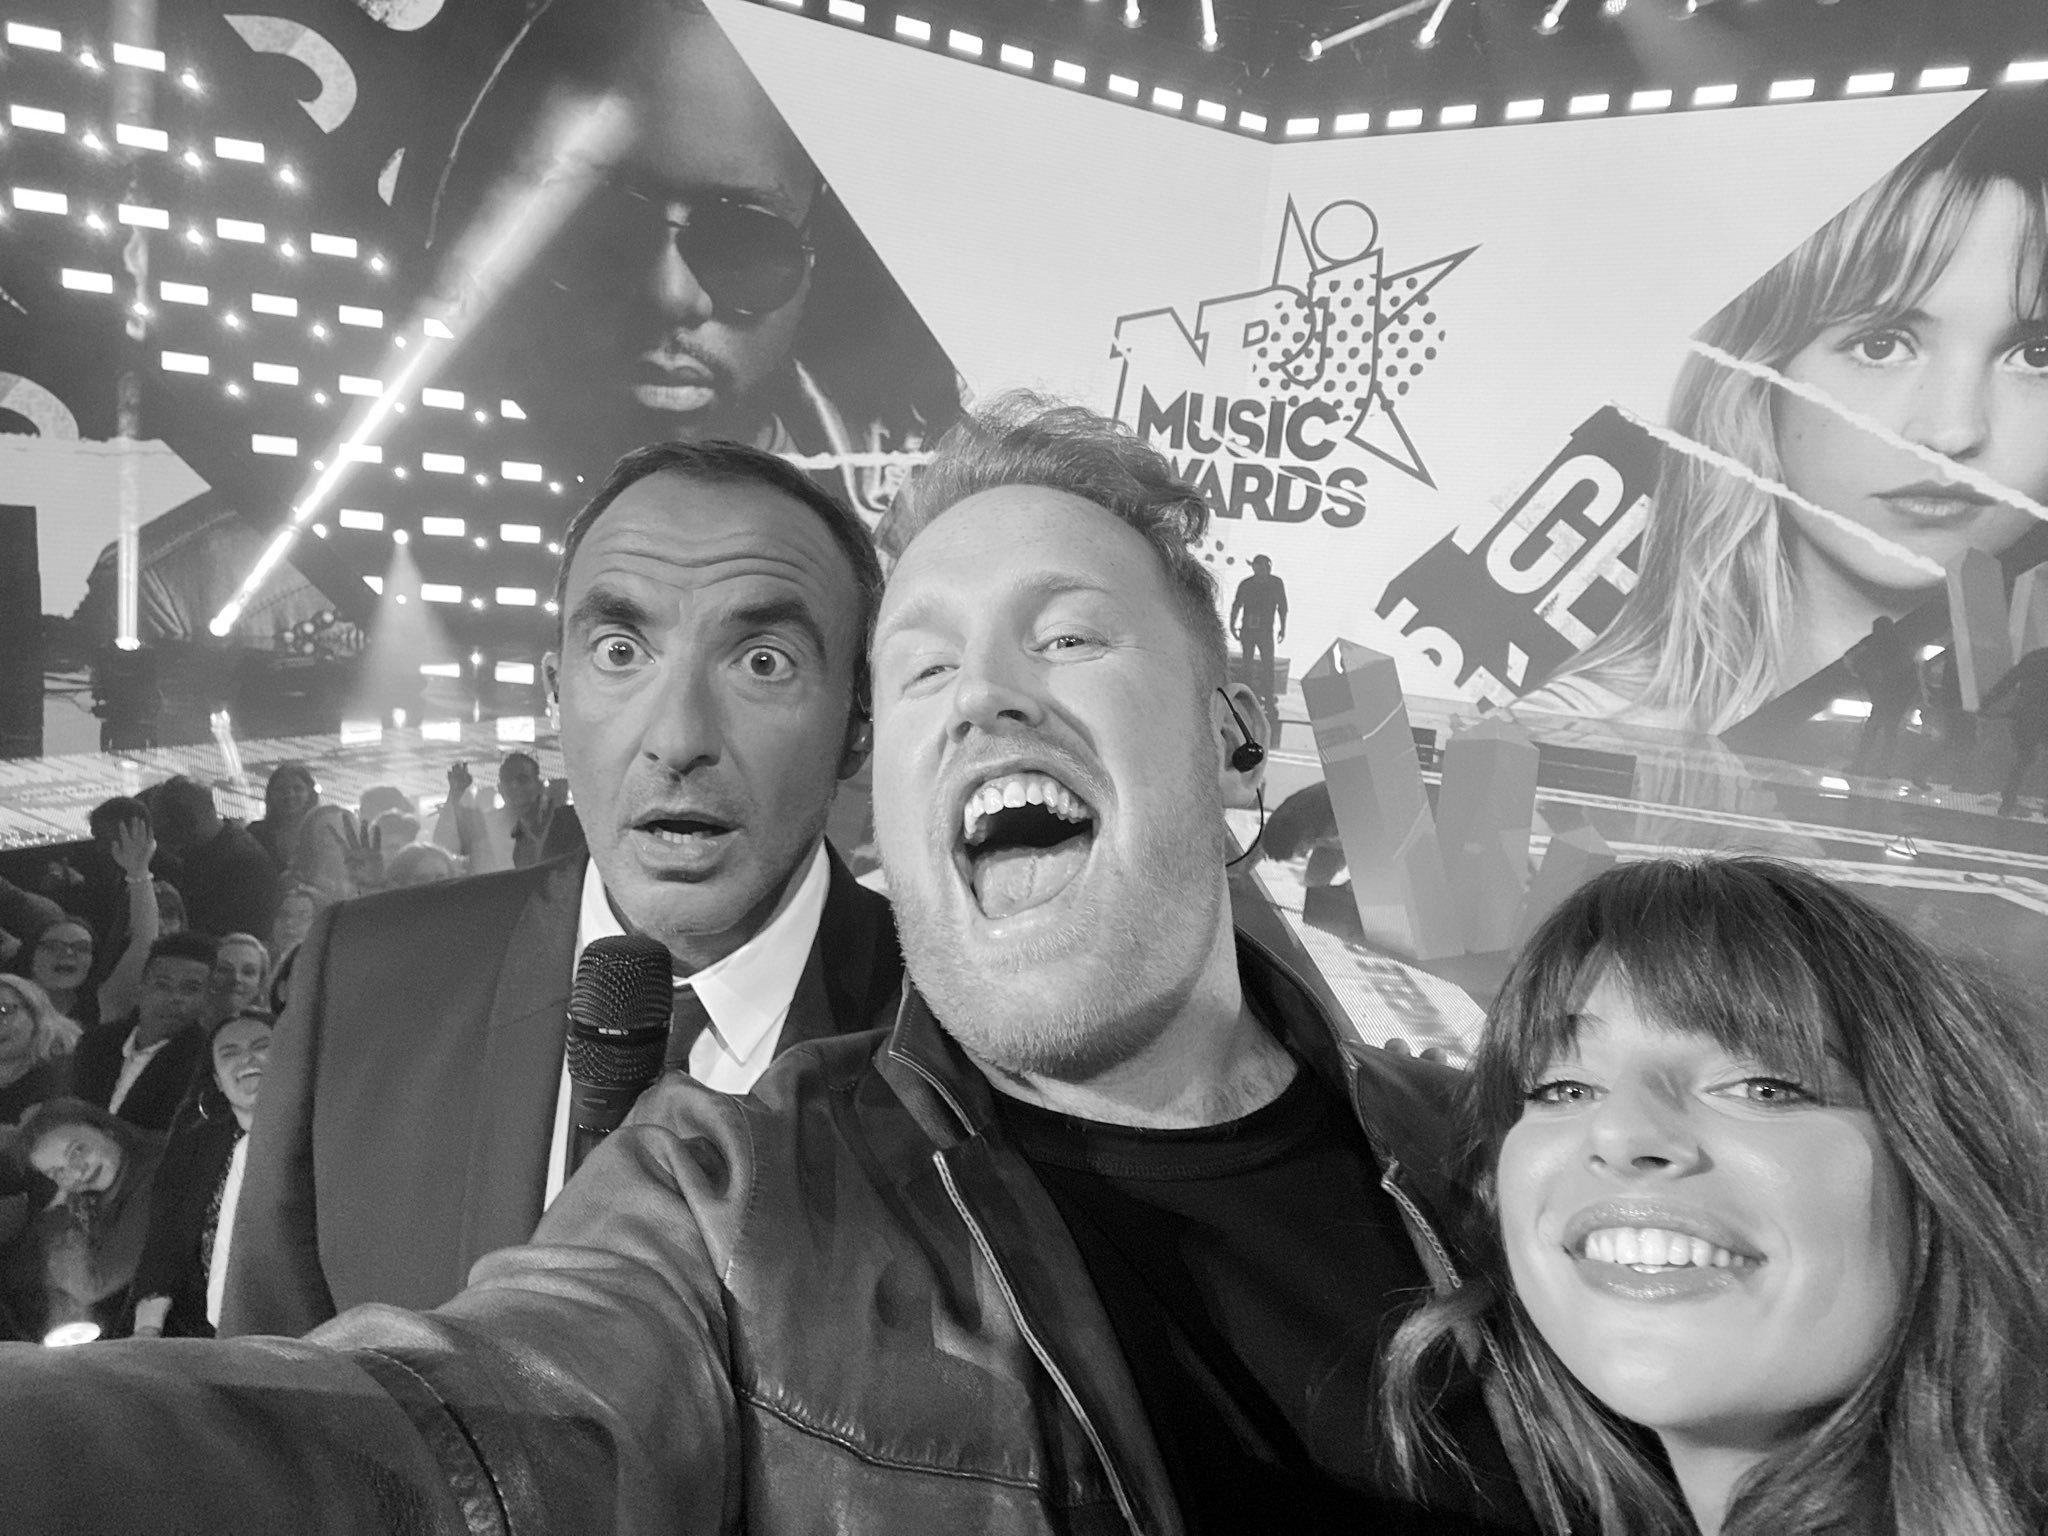 NRJ Music Awards 2019 - NMA 2019 - Nikos - Selfie - Gavin James